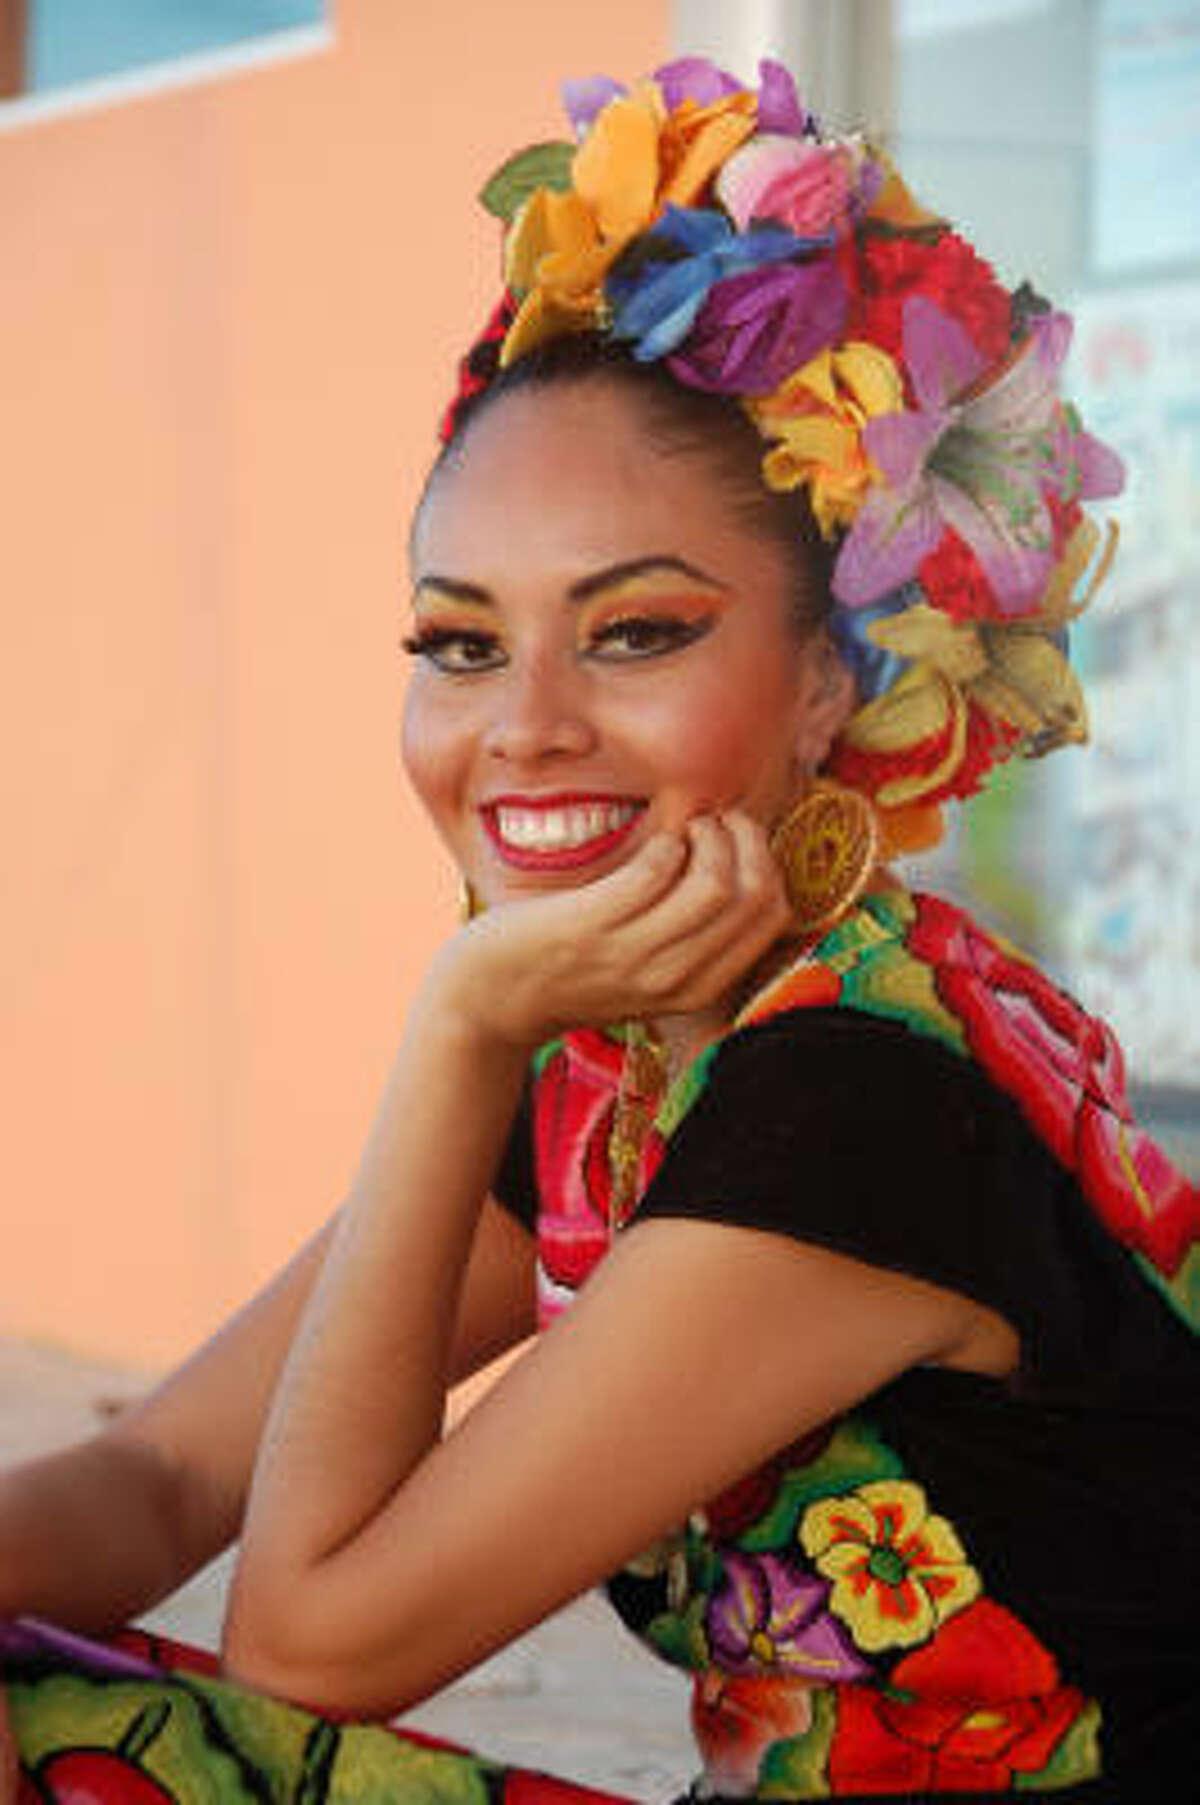 A Mayan dancer on the beach in Cozumel.